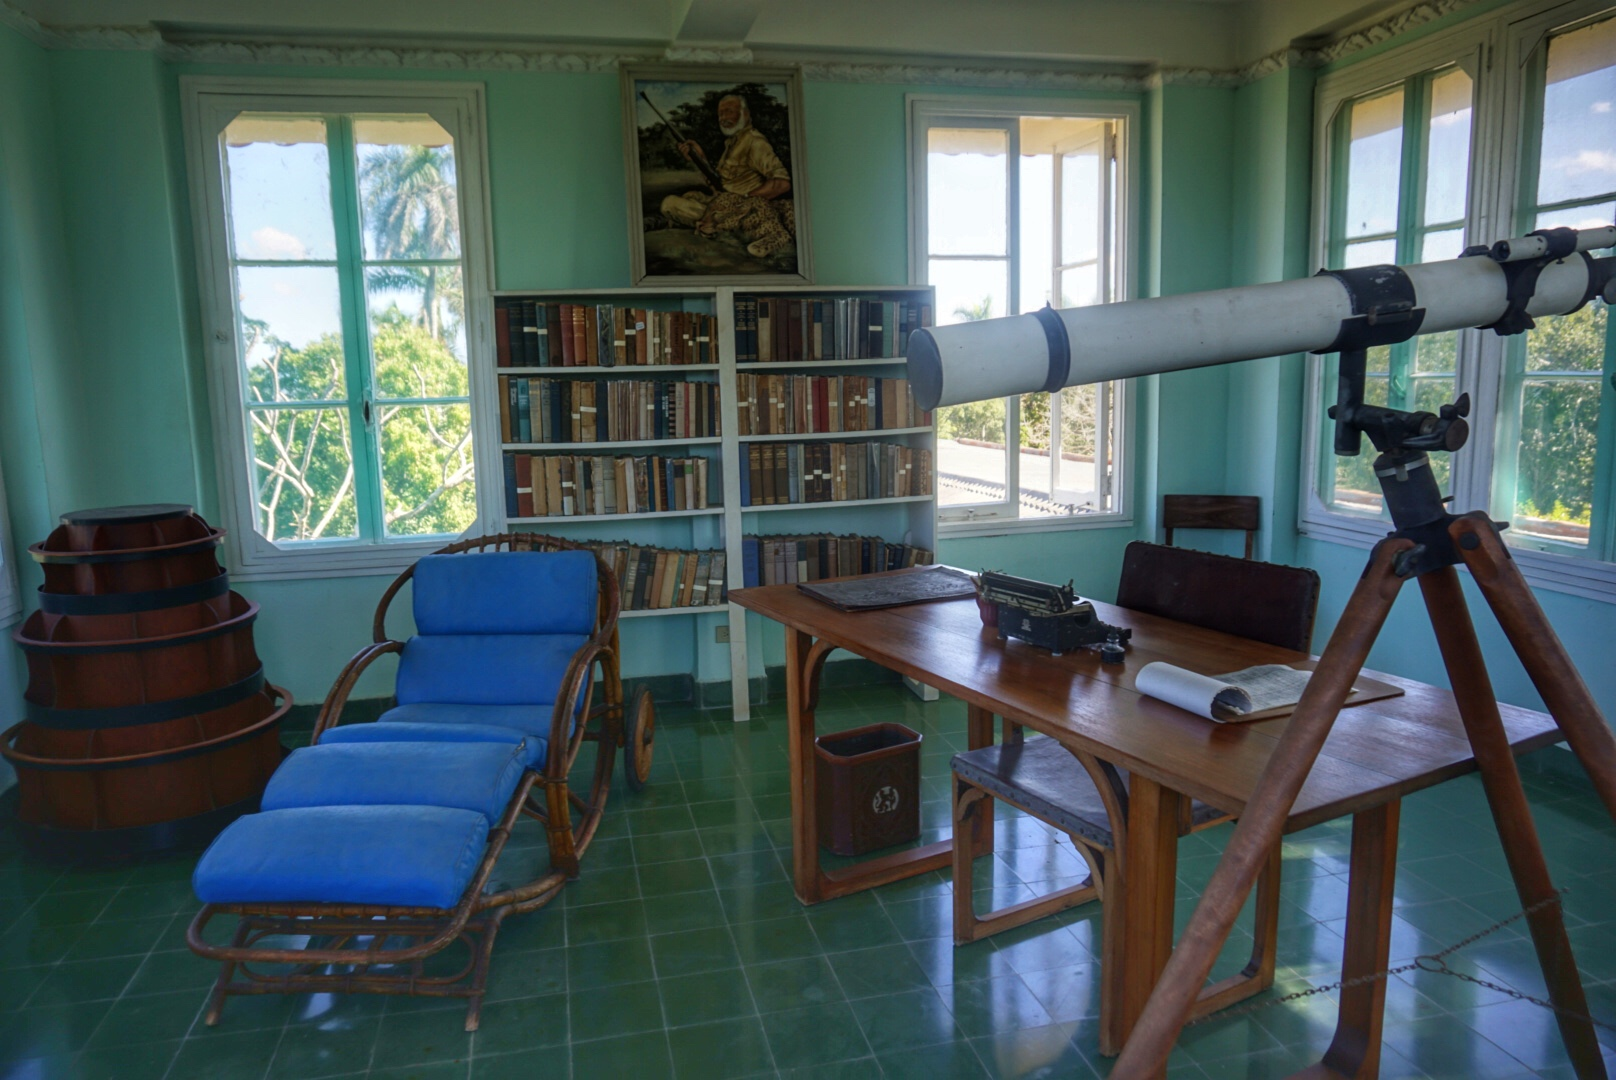 Inside Ernest Hemingway's house in the Havana suburb of San Francisco de Paula.